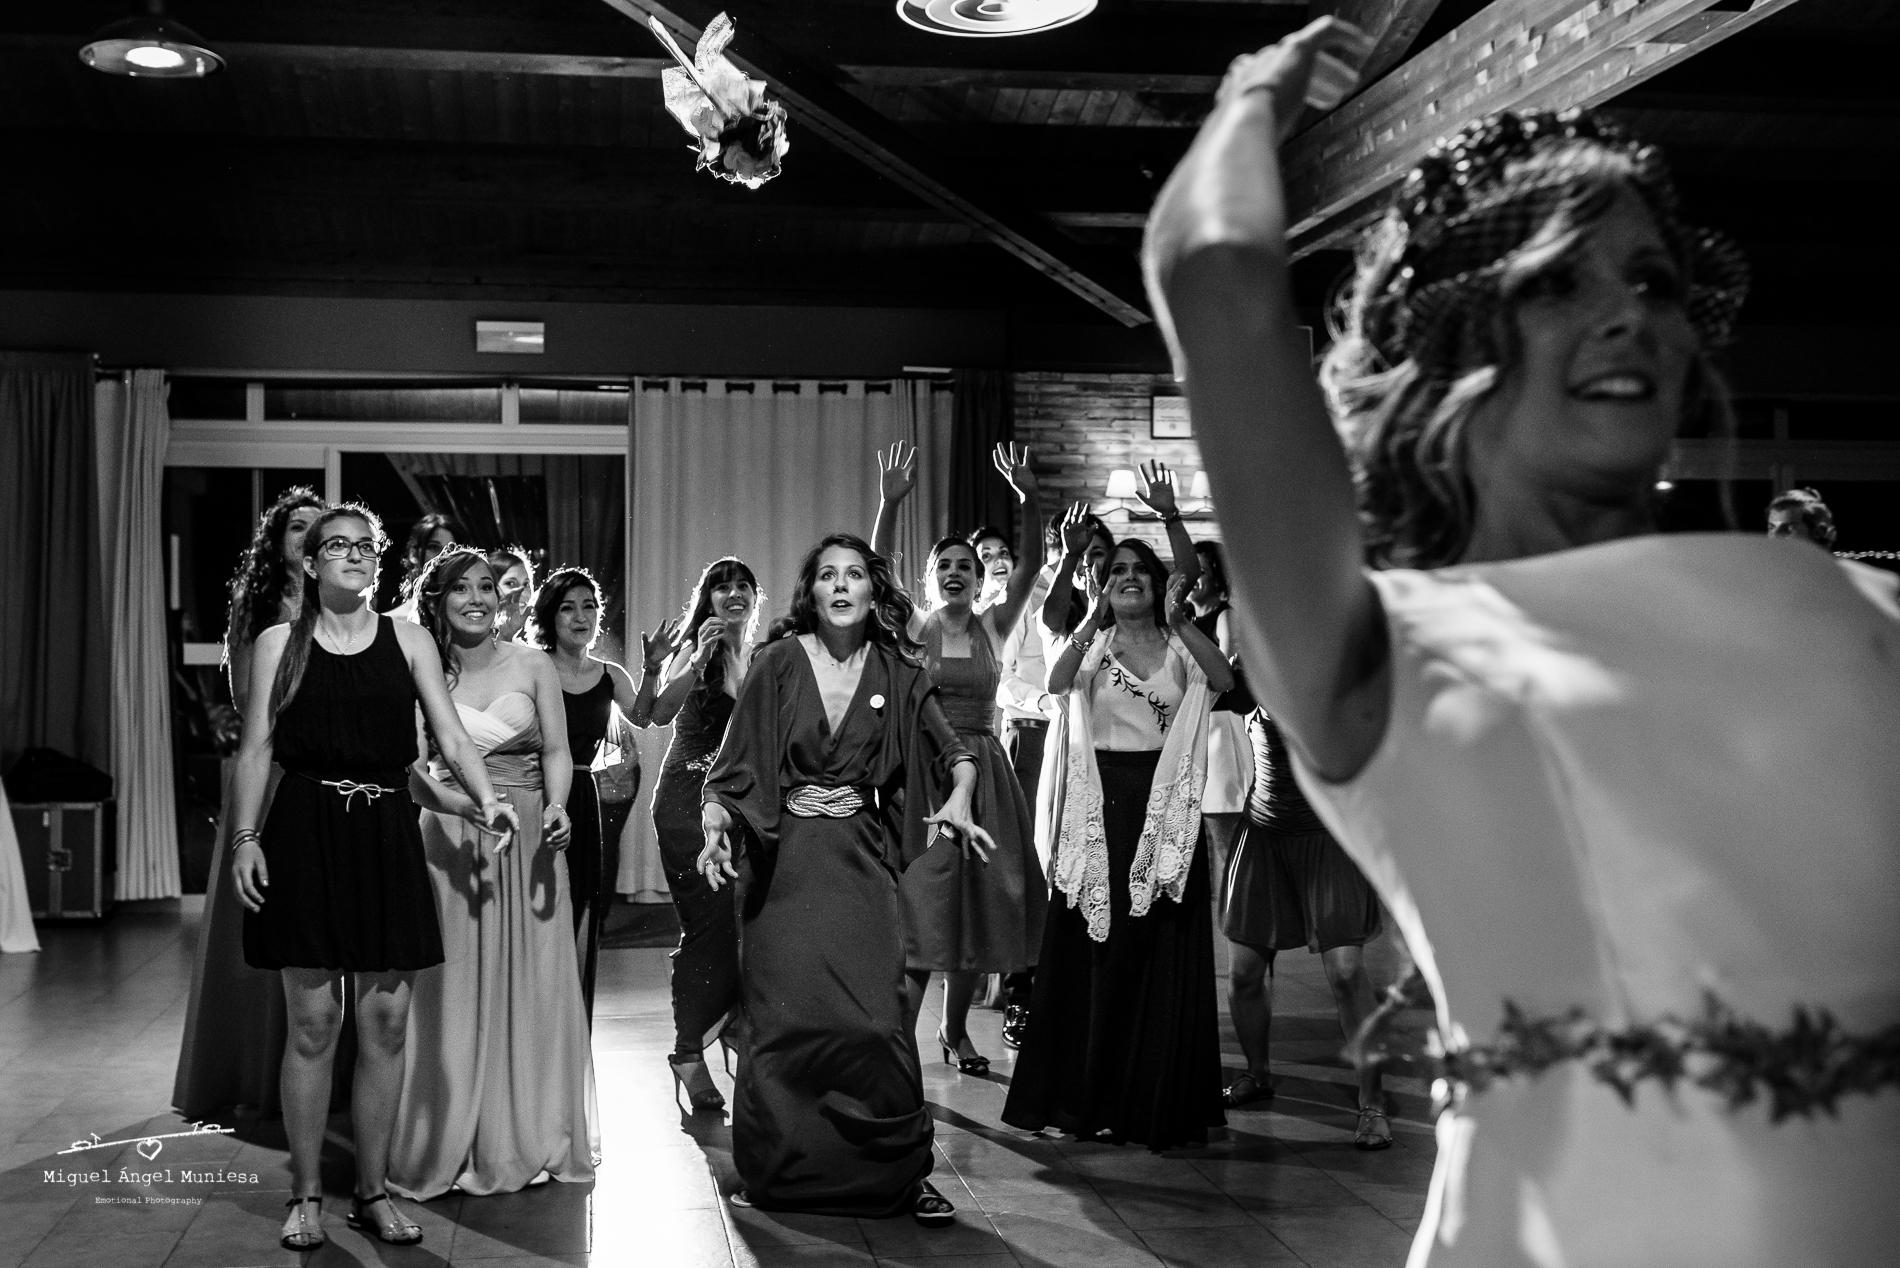 boda, fotografia de boda, boda zaragoza, fotografia, wedding, wedding photography, miguel angel muniesa, fotografo boda Zaragoza, fotografo boda, destination wedding_ 043